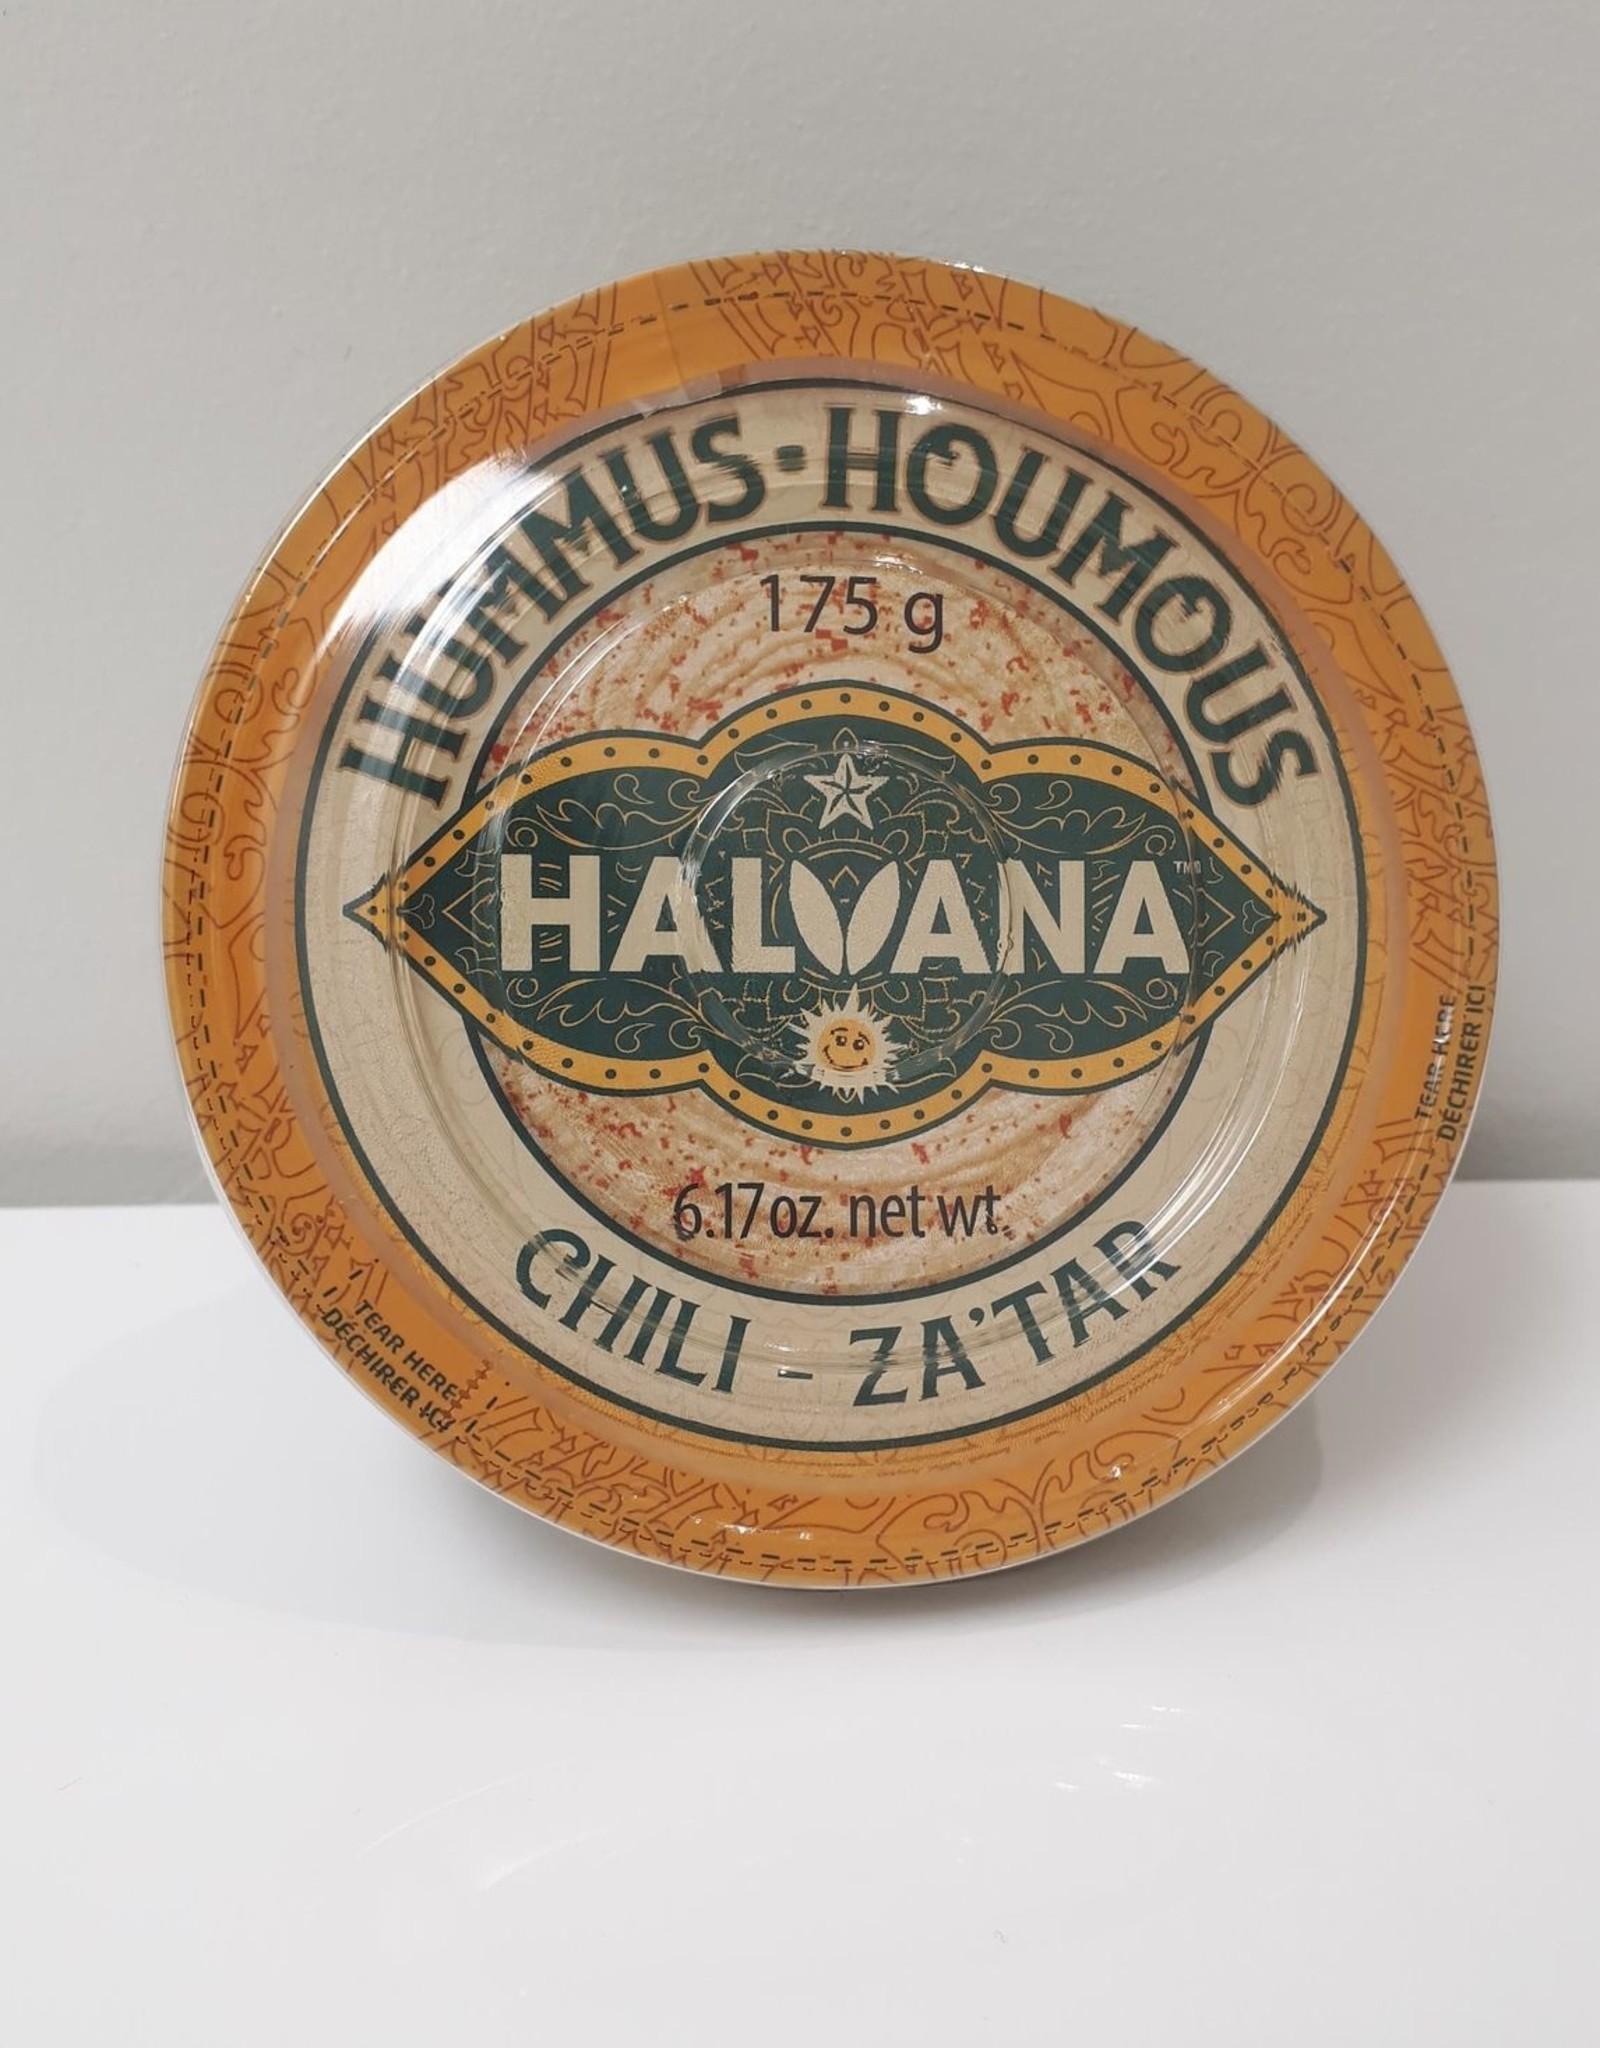 Halvana Halvana - Hummus, Chili Zatar (175g)